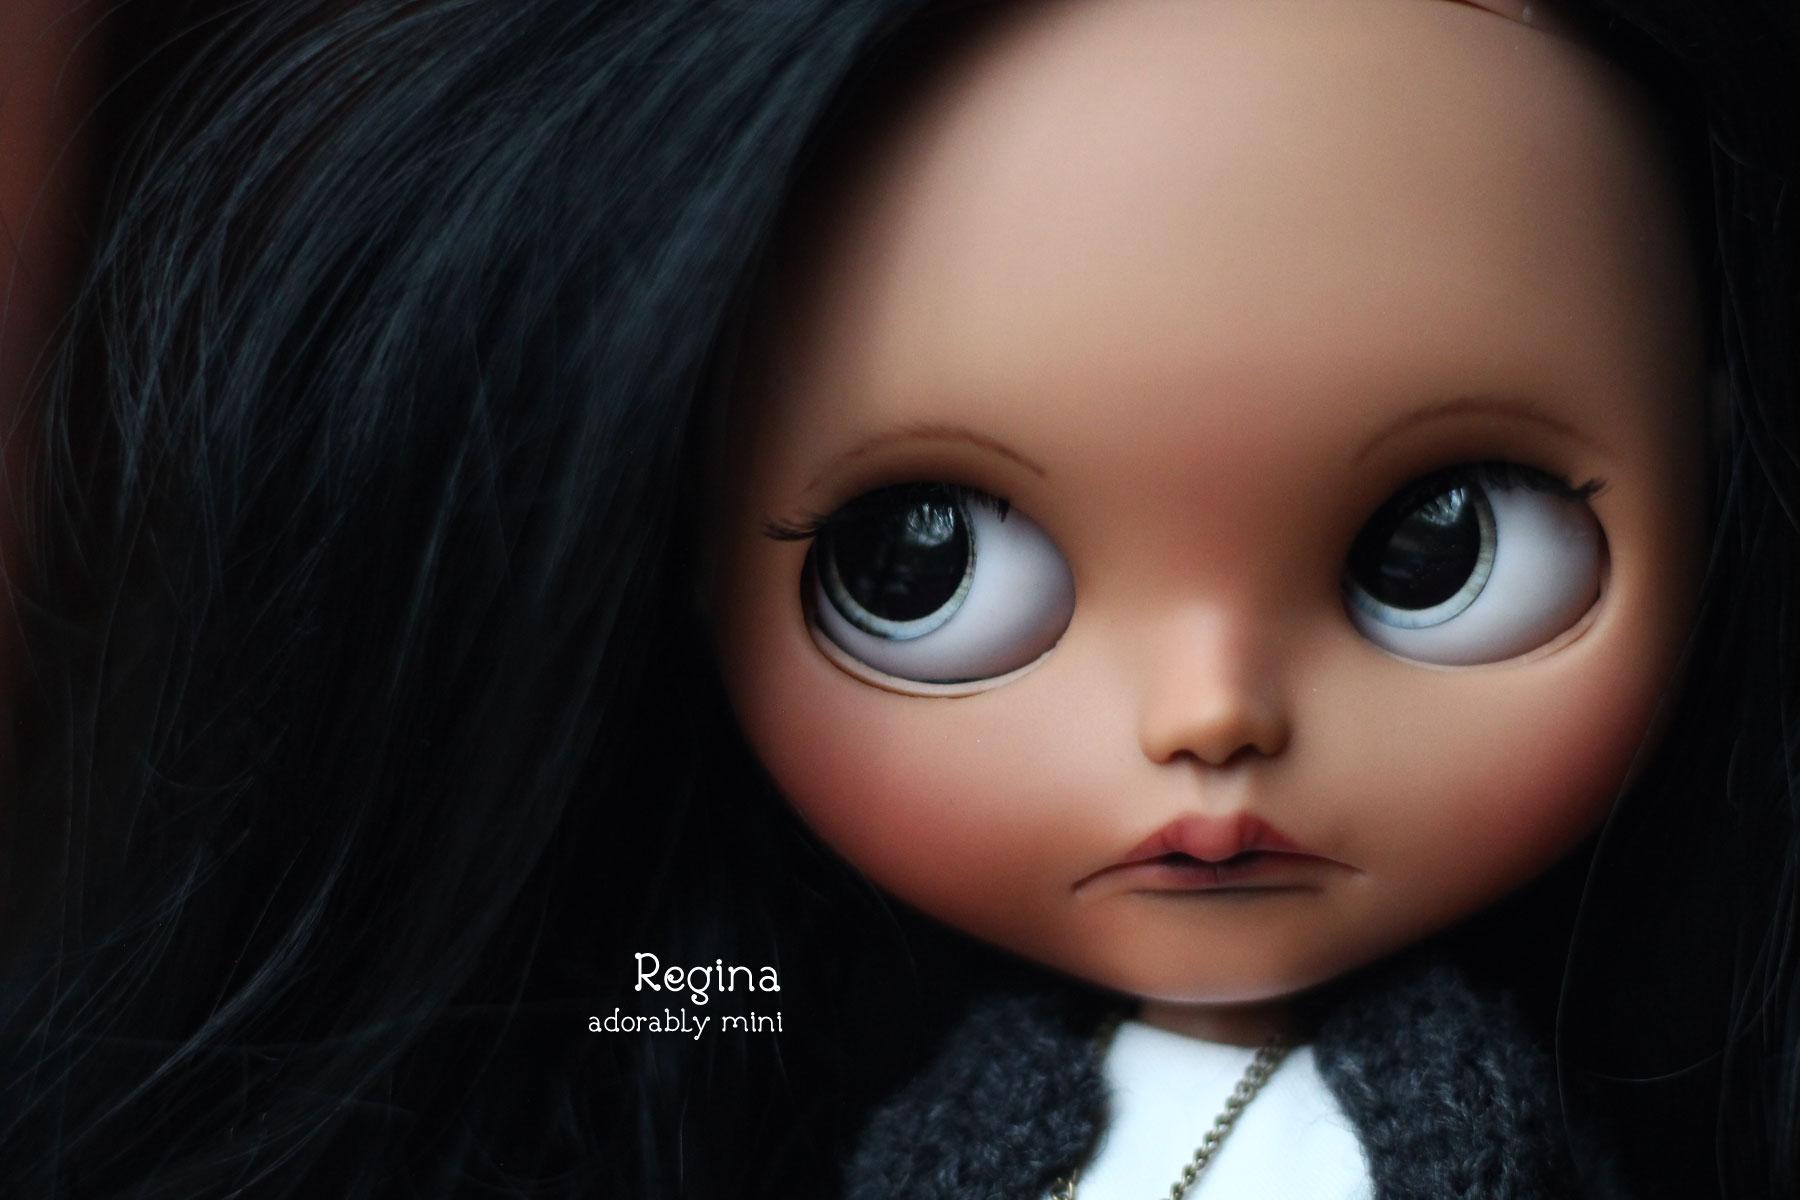 Pretty Custom Blythe Doll with sad face